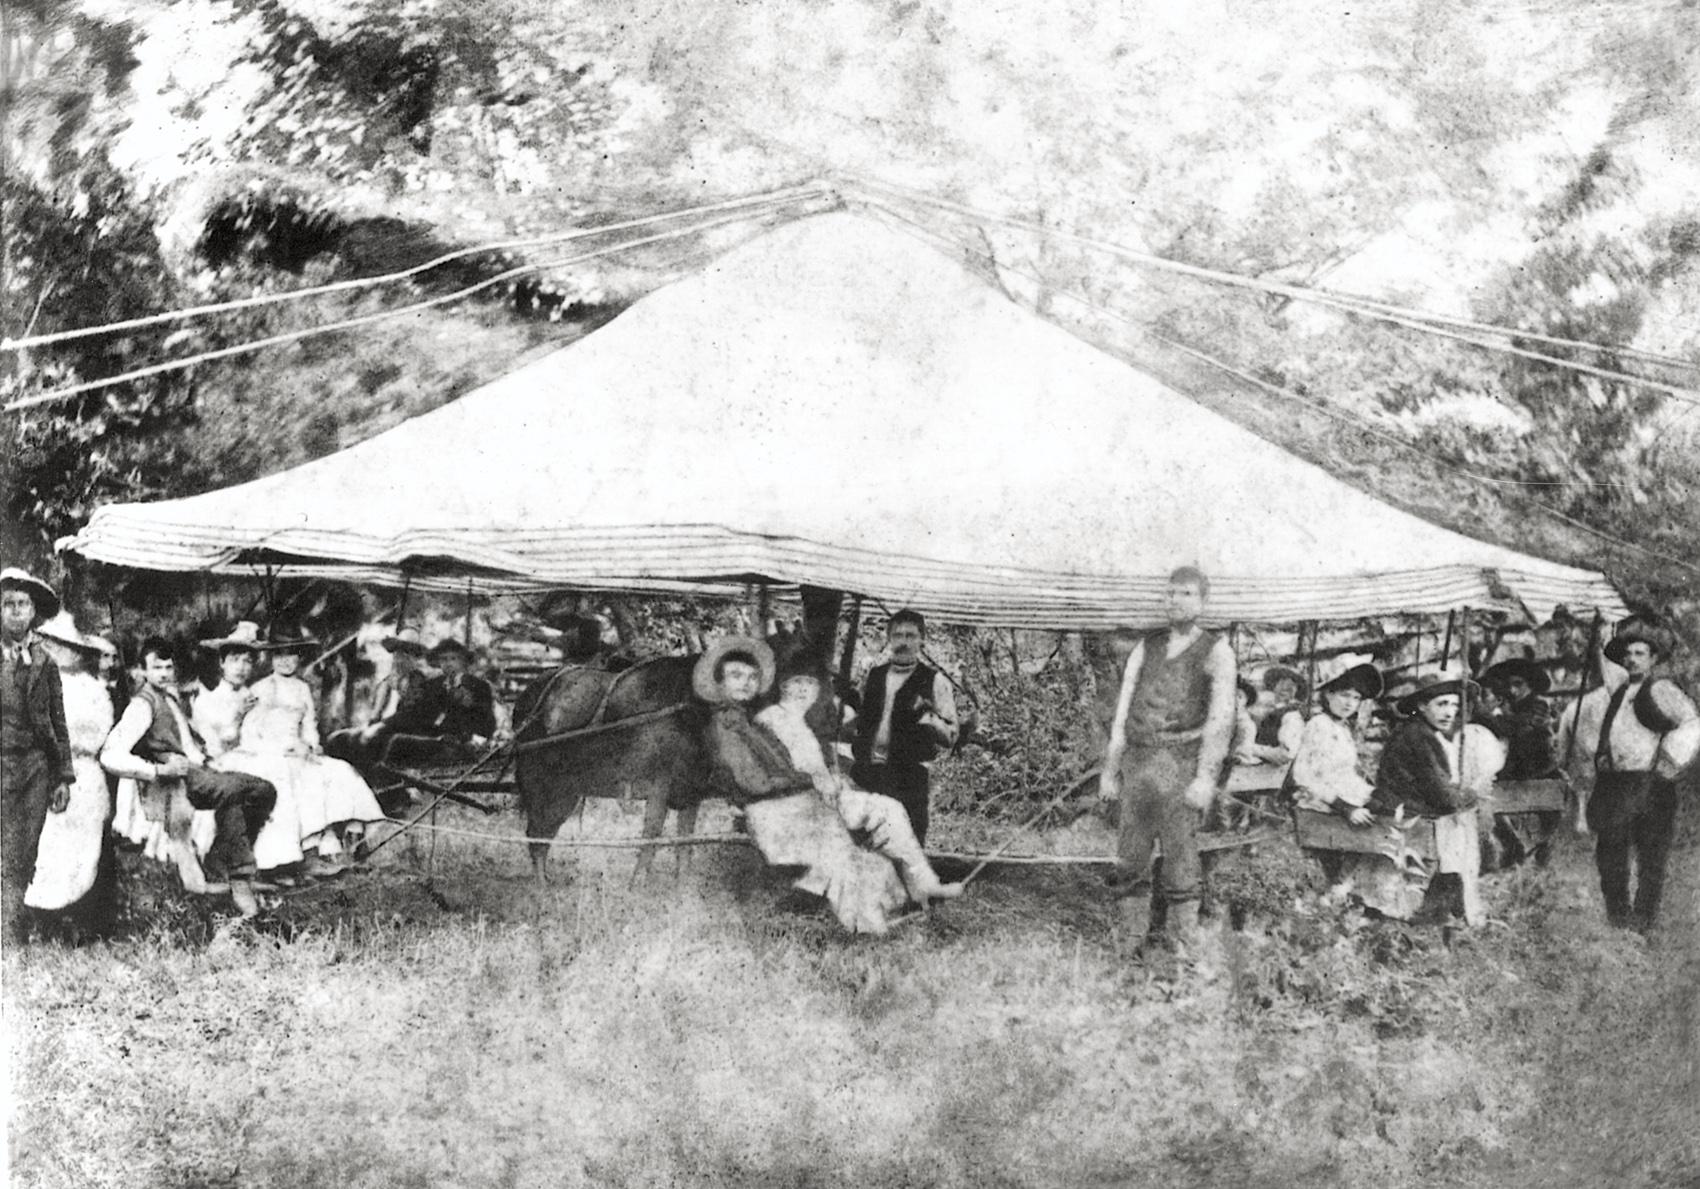 ca-1890-primitive-carousel-Ada-OK-D-Maxwell-photo